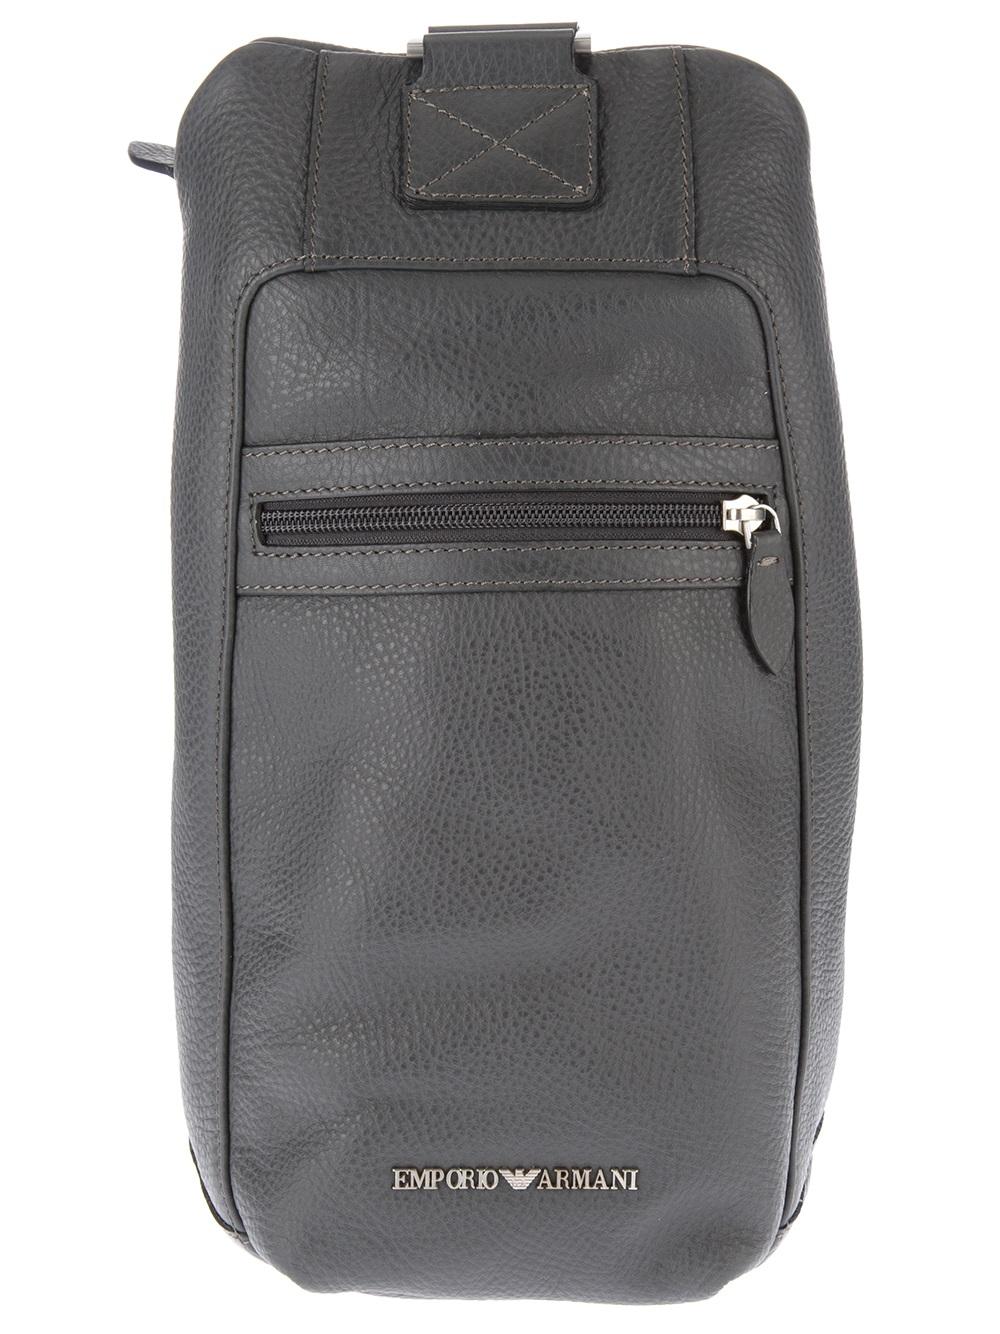 Lyst - Emporio Armani Leather Shoulder Bag in Gray for Men b12f44de6fff3